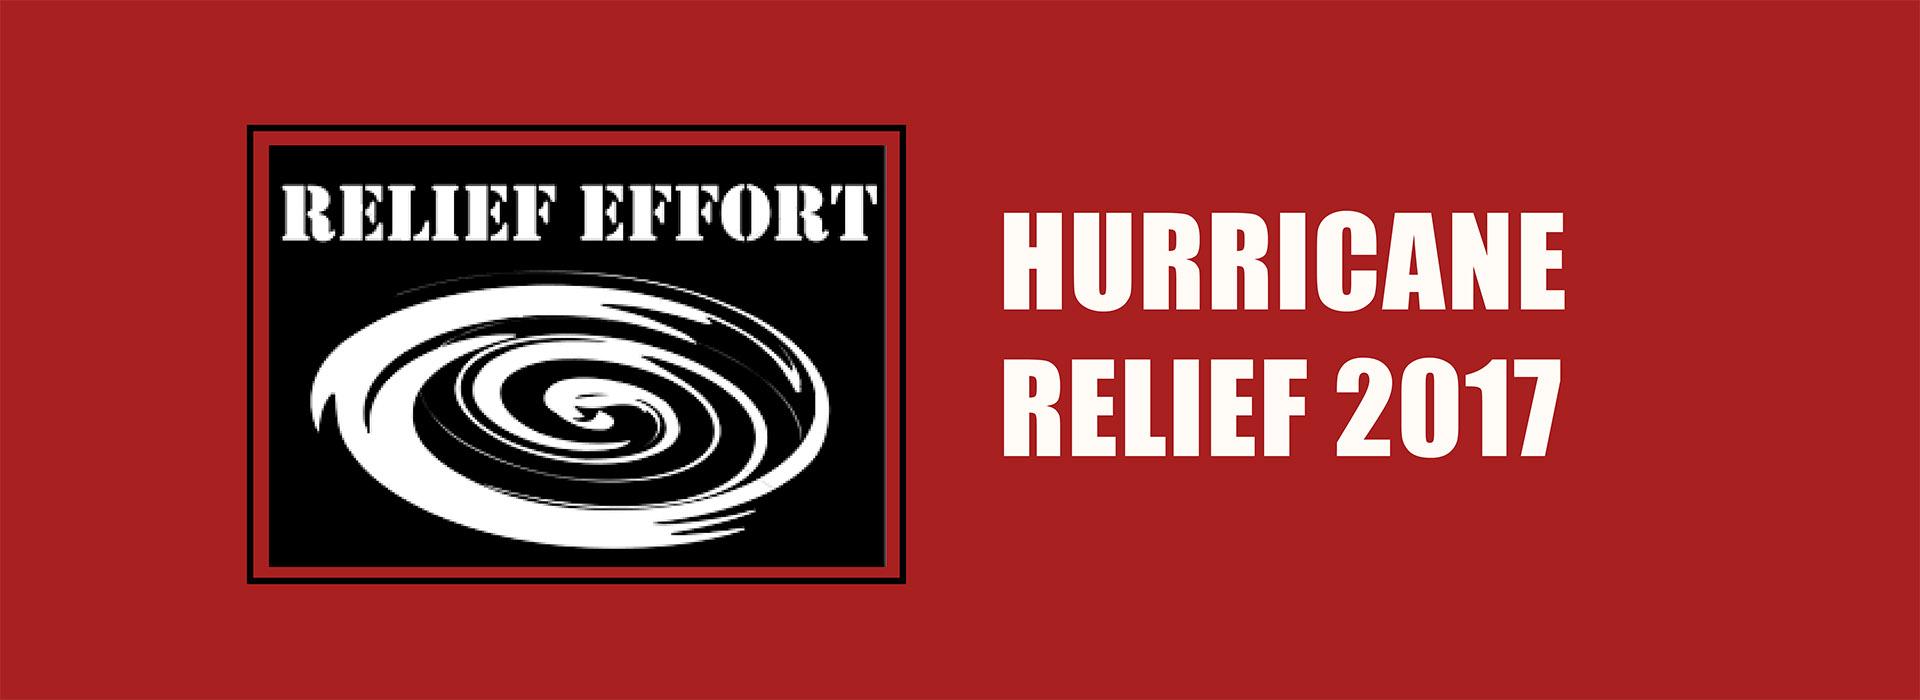 hurricane-relief3